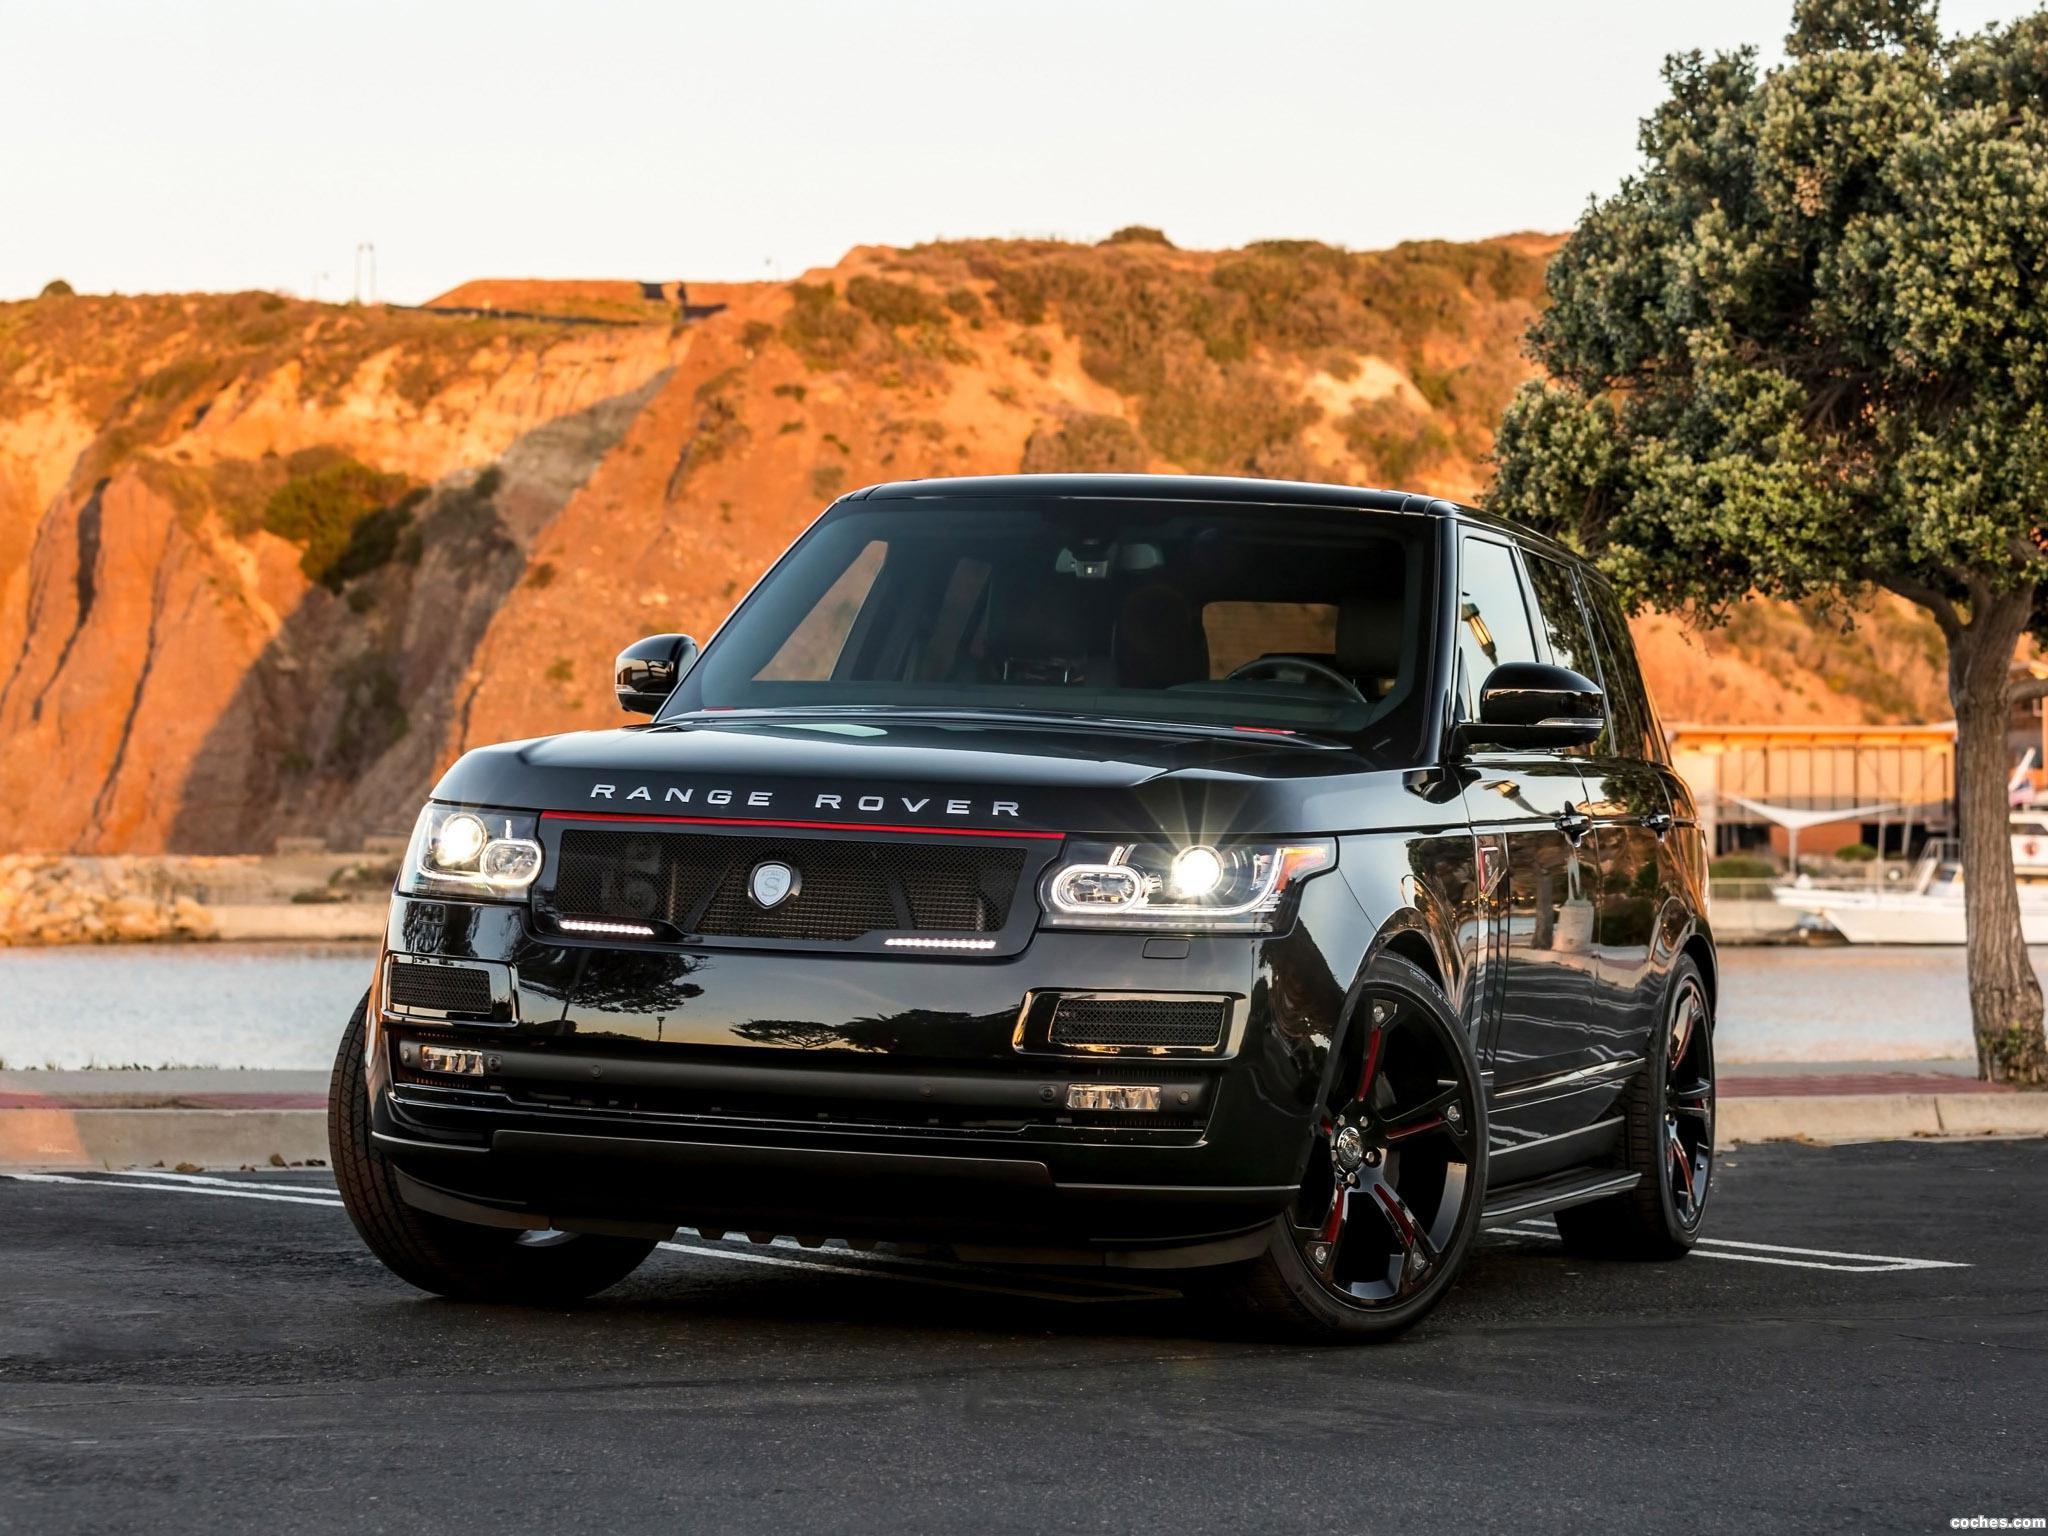 Foto 0 de Strut Land Rover Range Rover 2015